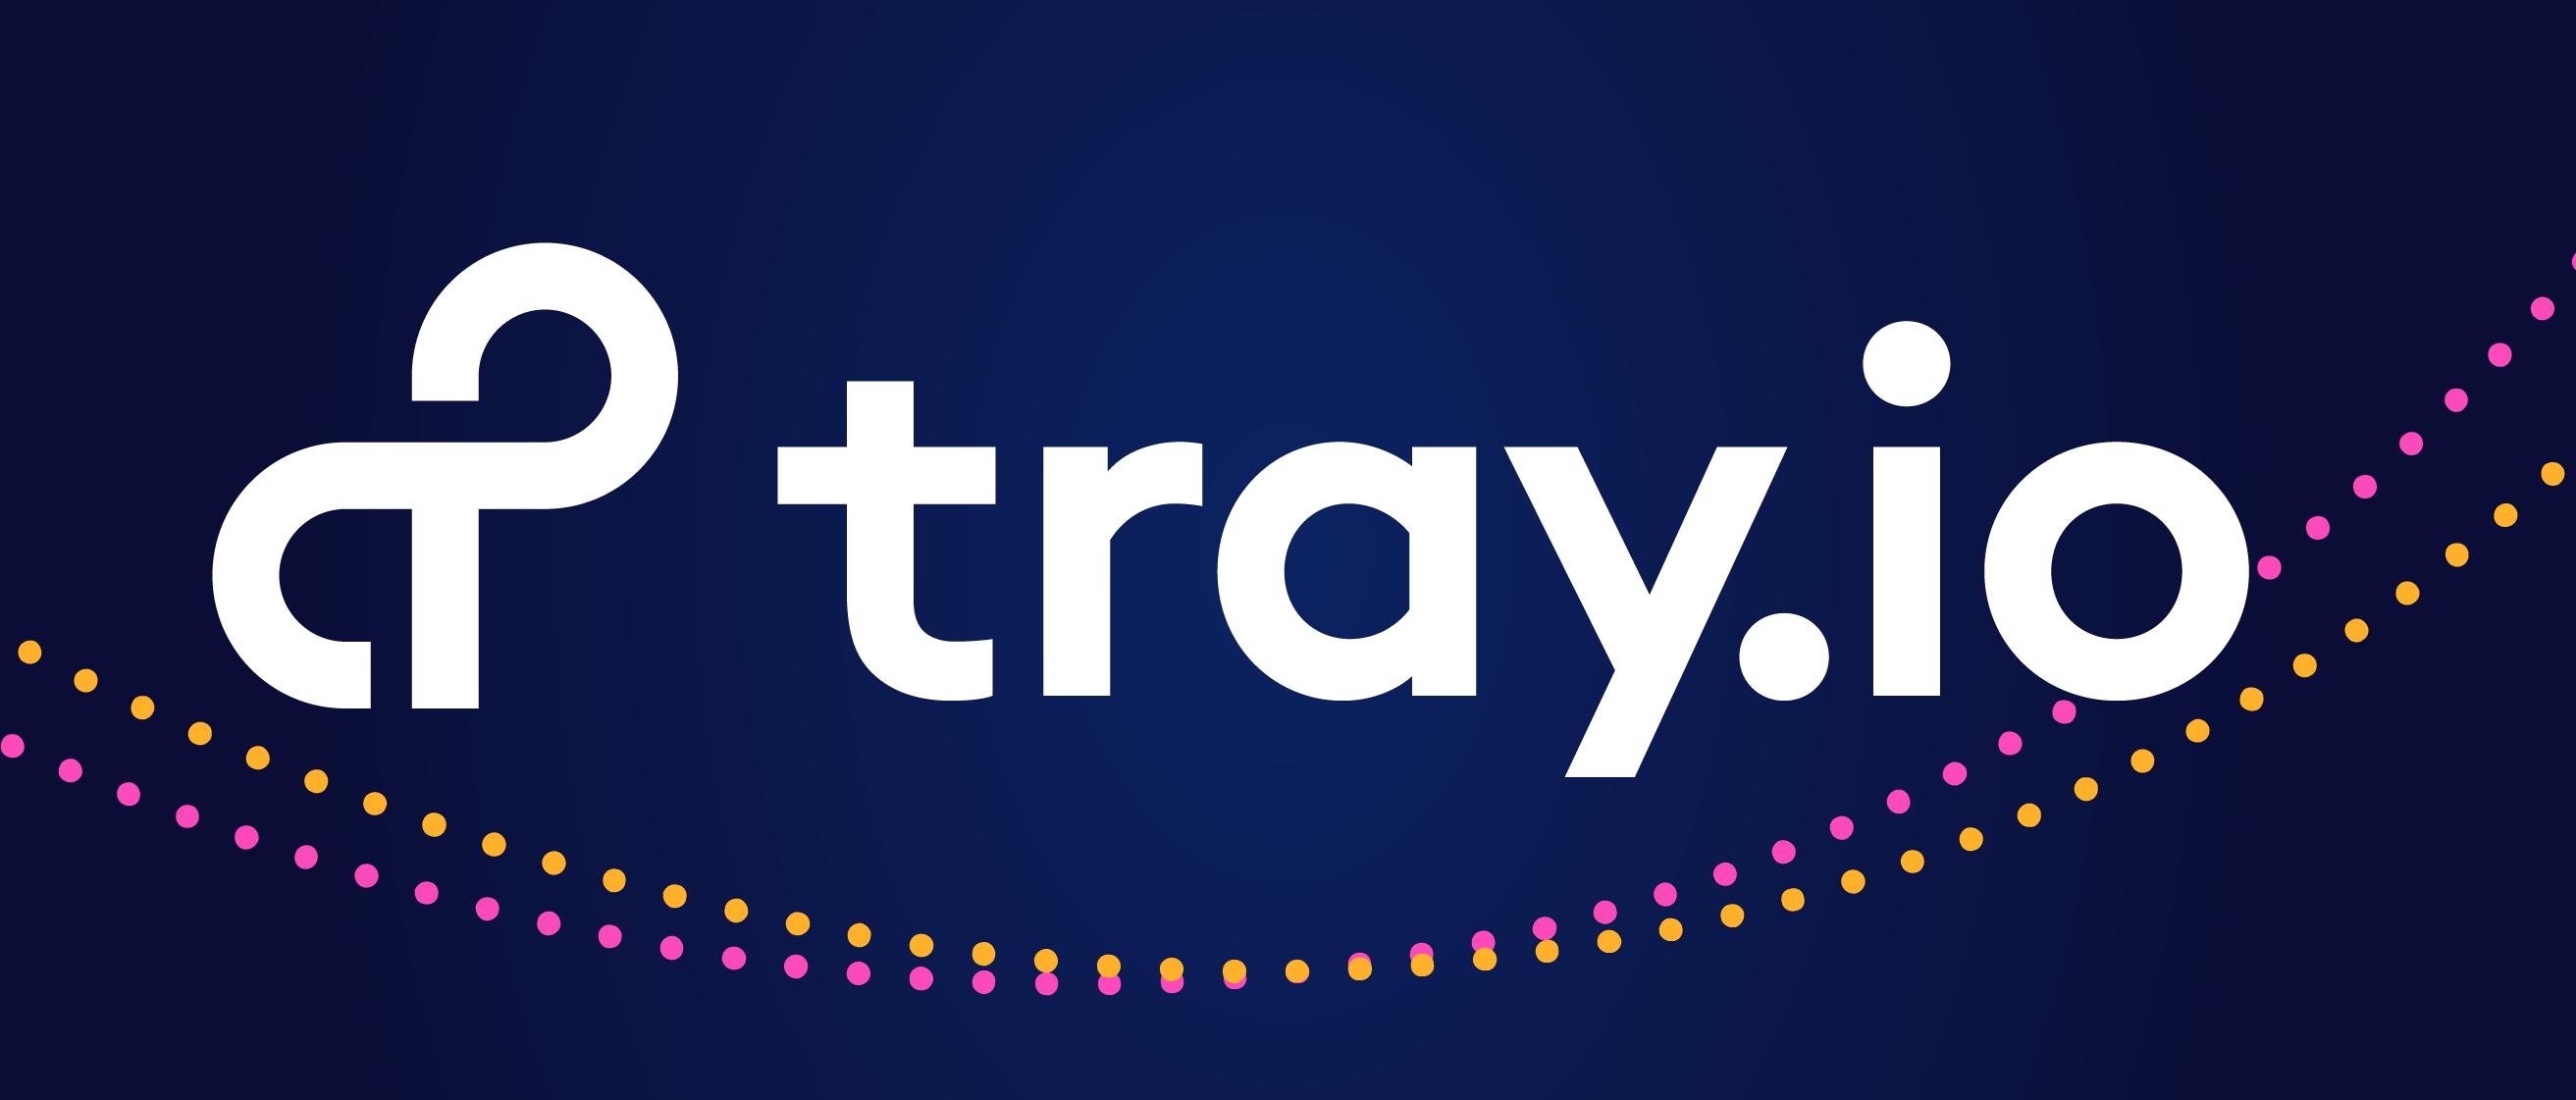 Tray Series C 1